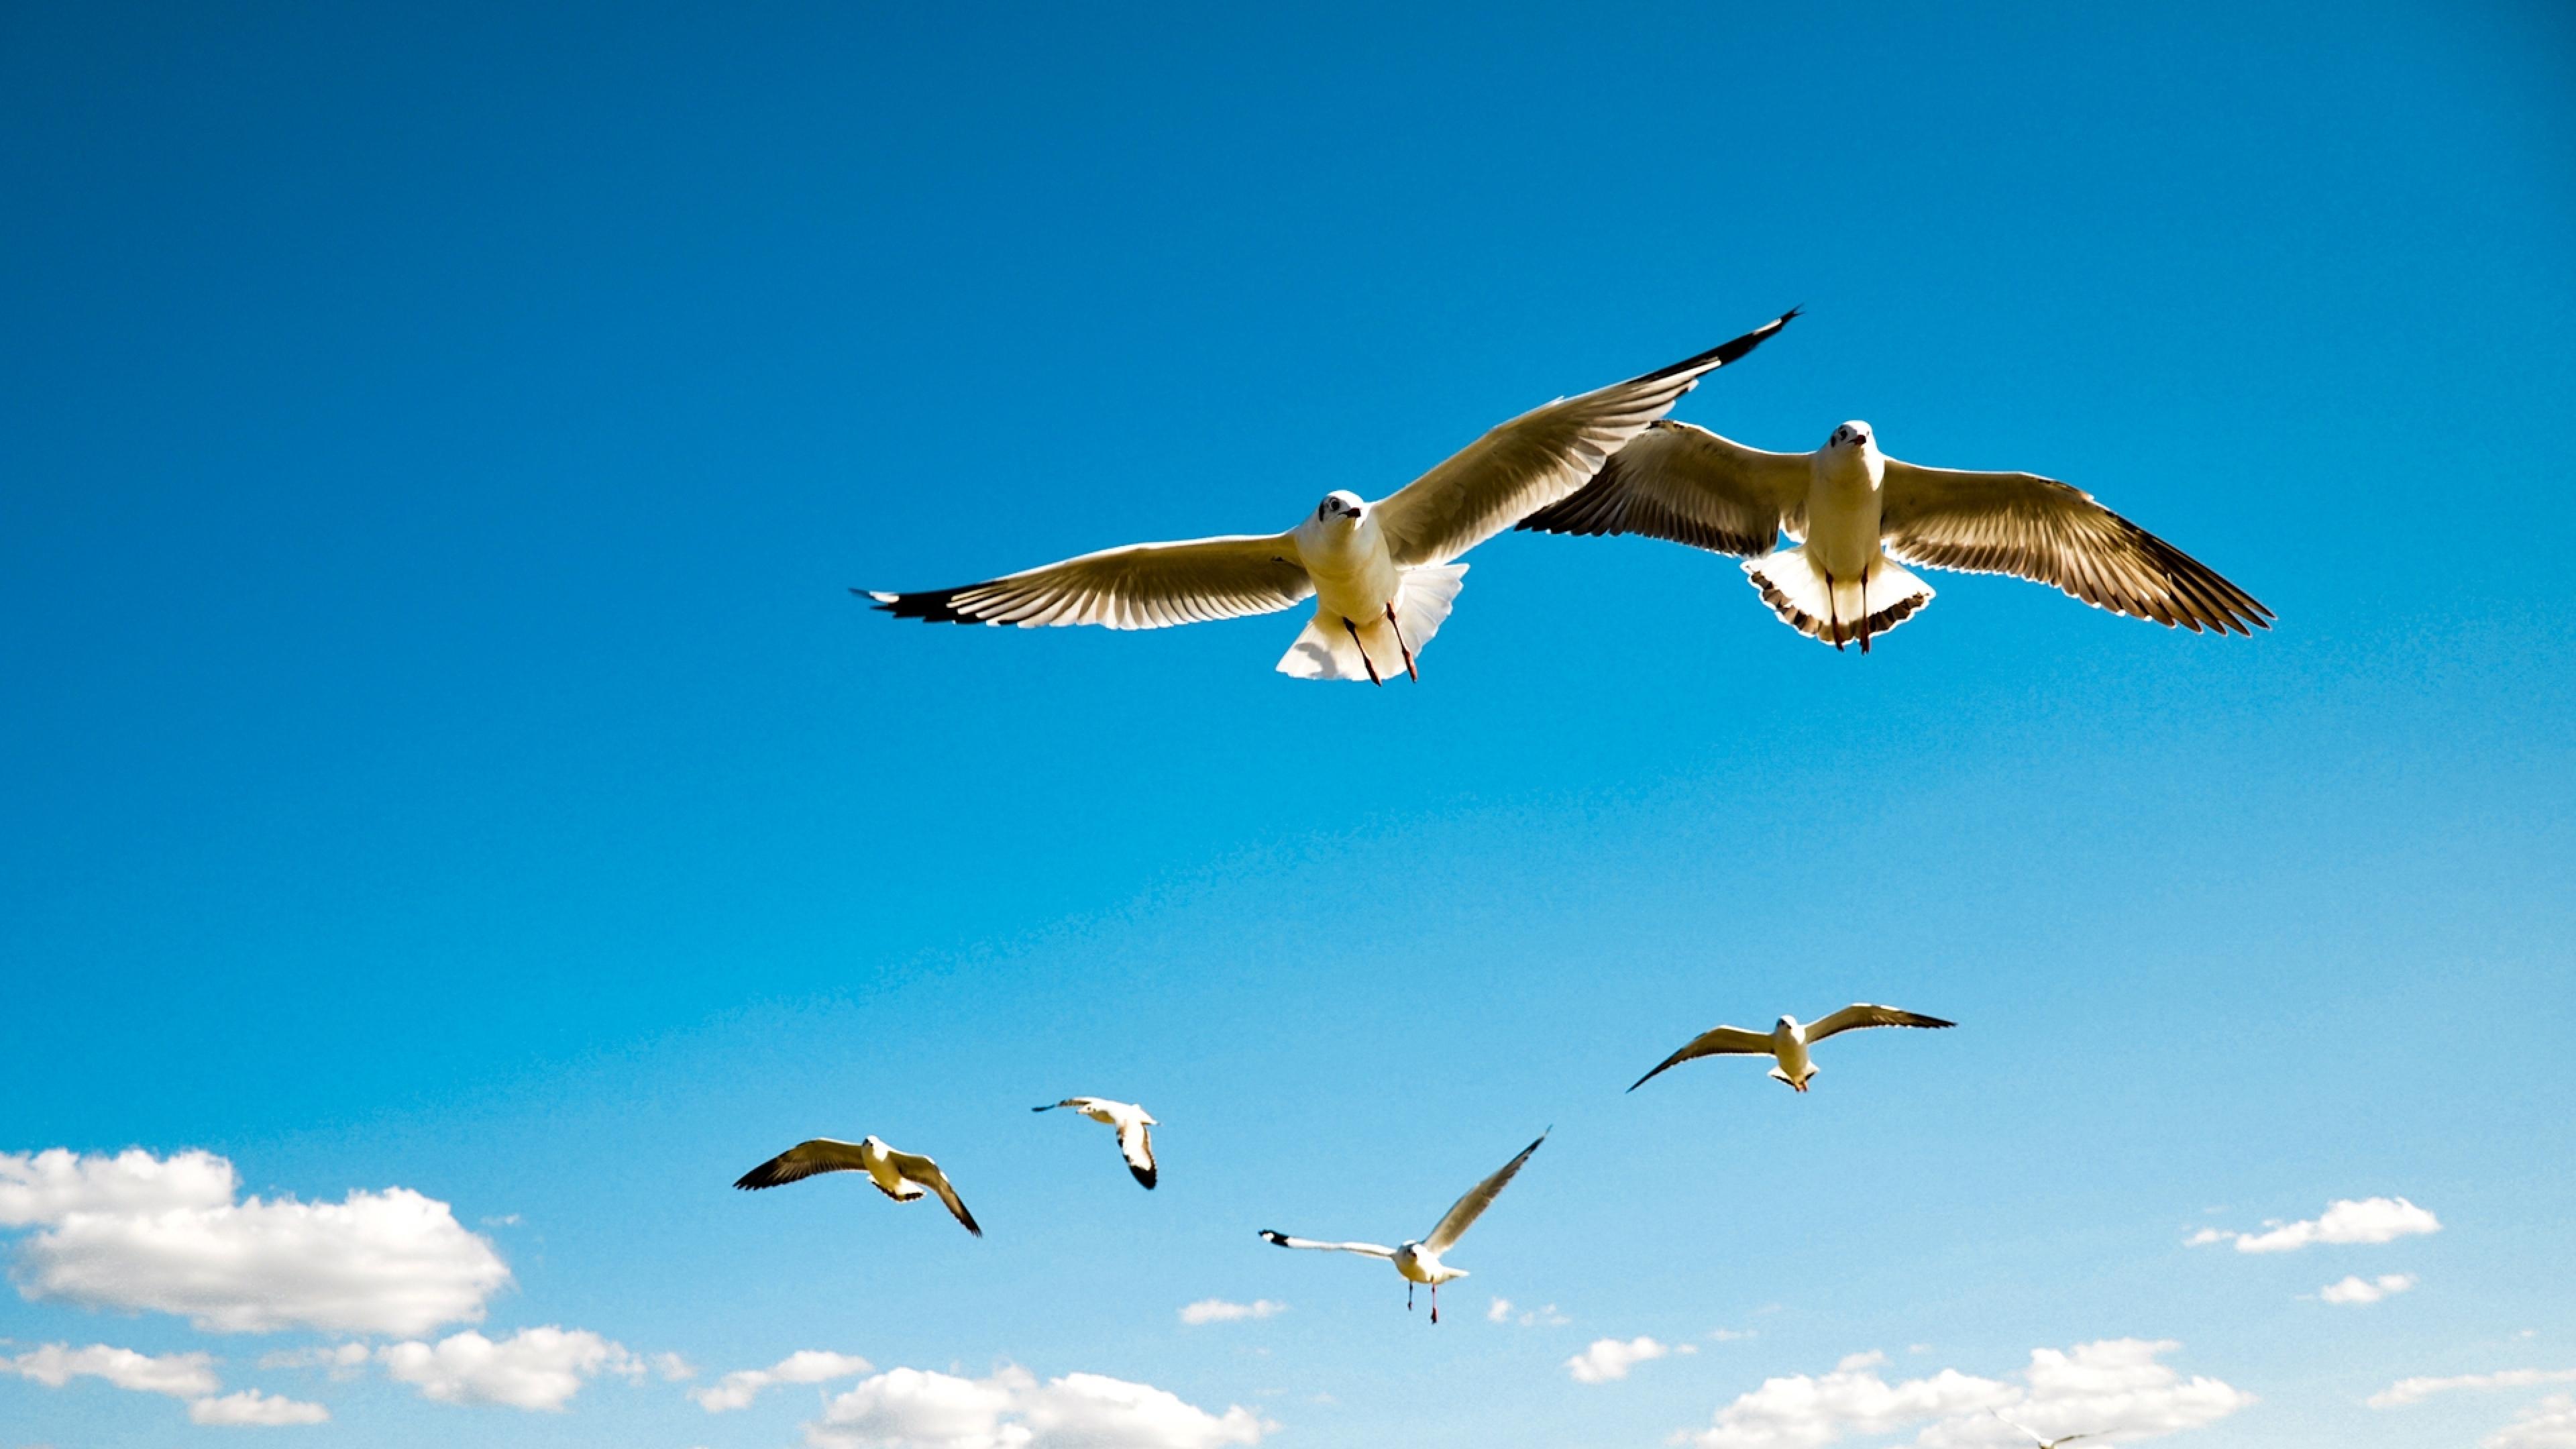 Wallpapers Hd Flying Birds Apple Animals Blue Sky Desktop: 4K The Flight Of A Bird Wallpapers High Quality